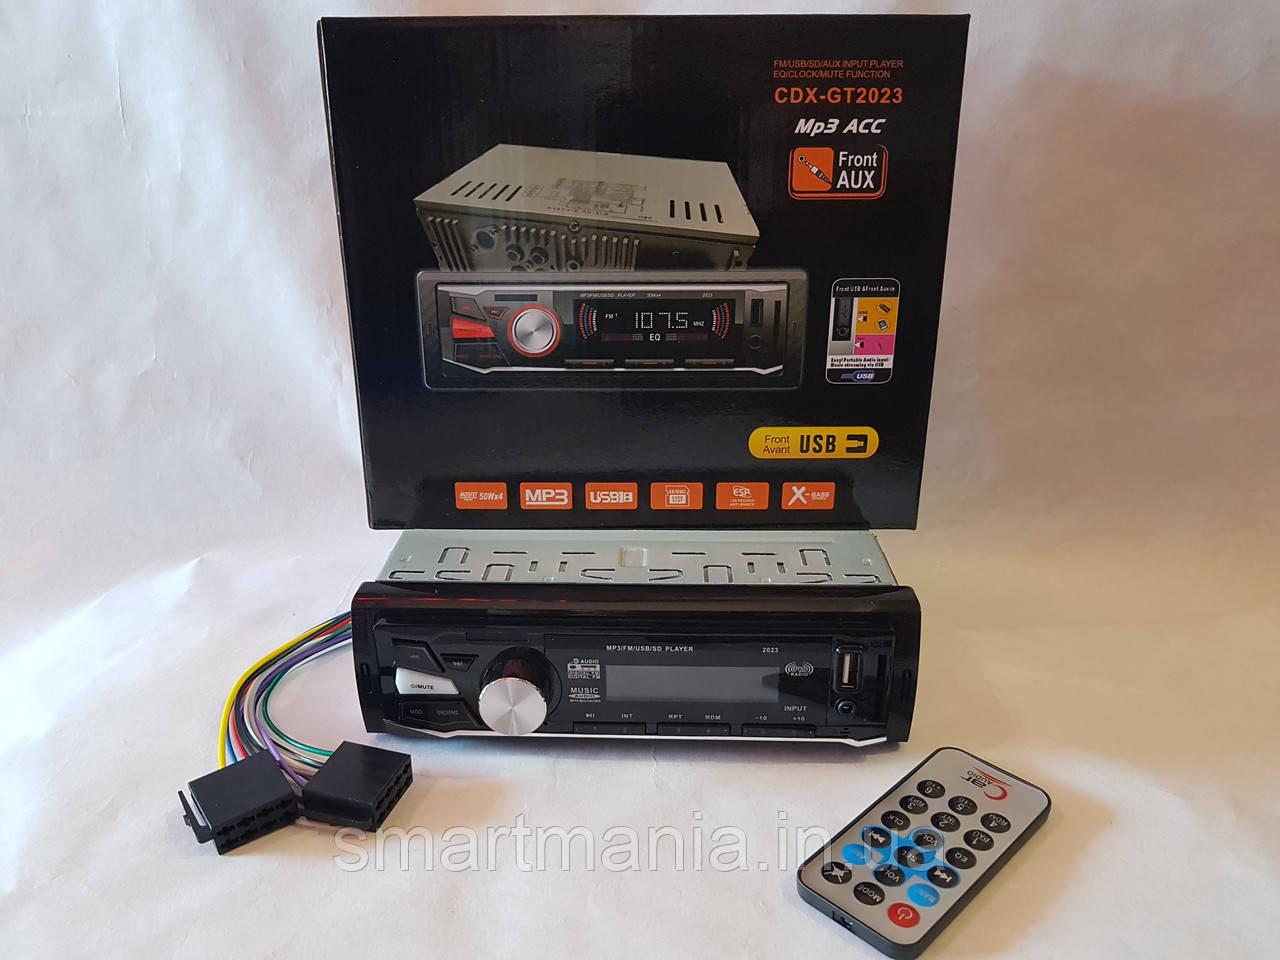 Авто Автомагнитола MP3, CDX-GT2023 (USB, SDHC, AUX, FM)